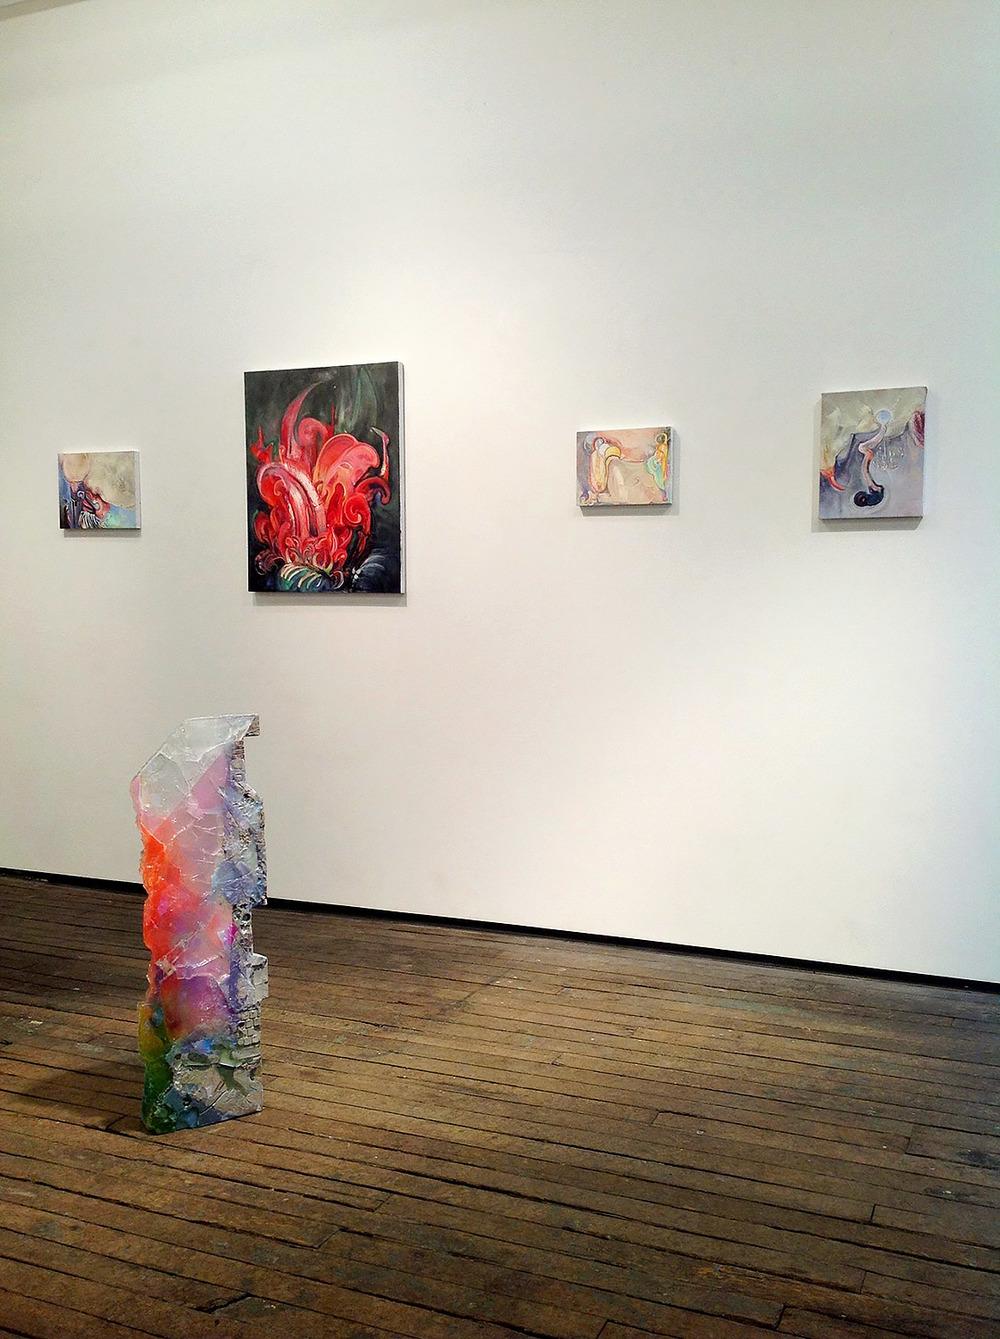 Brian Wood <br> Installation View <br> Brian Wood & Amy Brener <br> Novella at Salon Zurcher, 2015